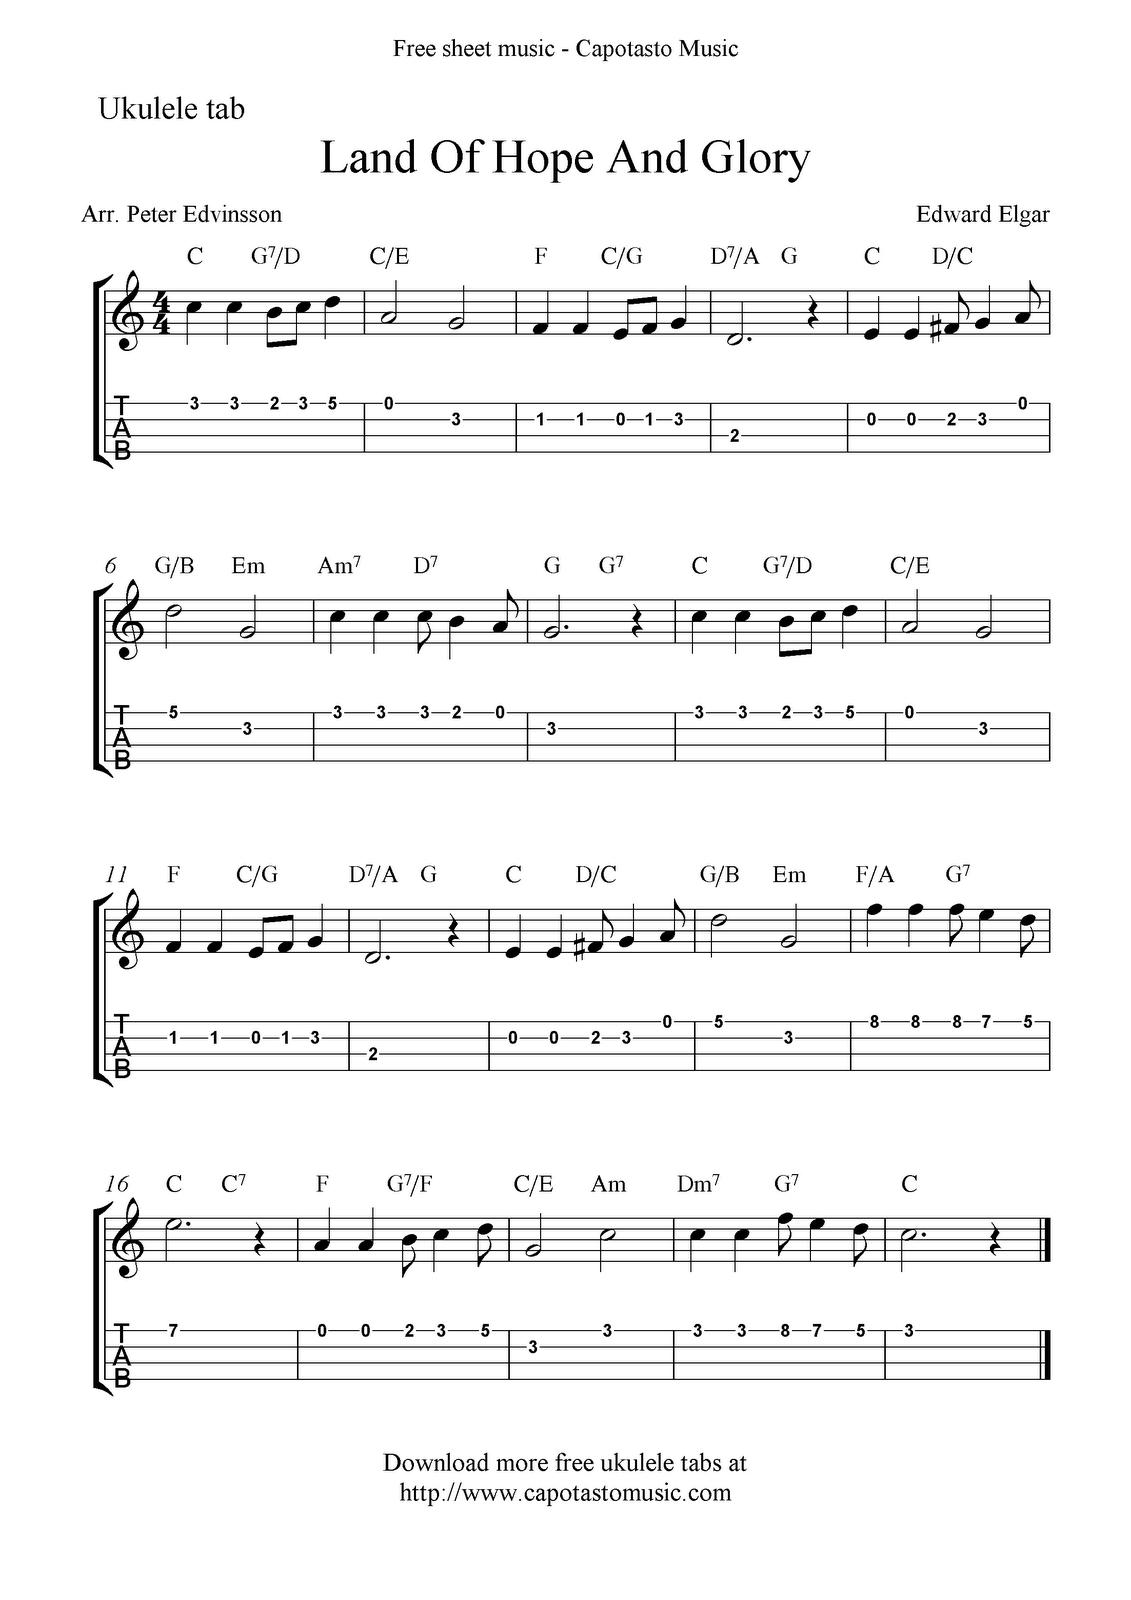 Free Sheet Music Scores: Land Of Hope And Glory (Pomp And - Free Printable Sheet Music Pomp And Circumstance